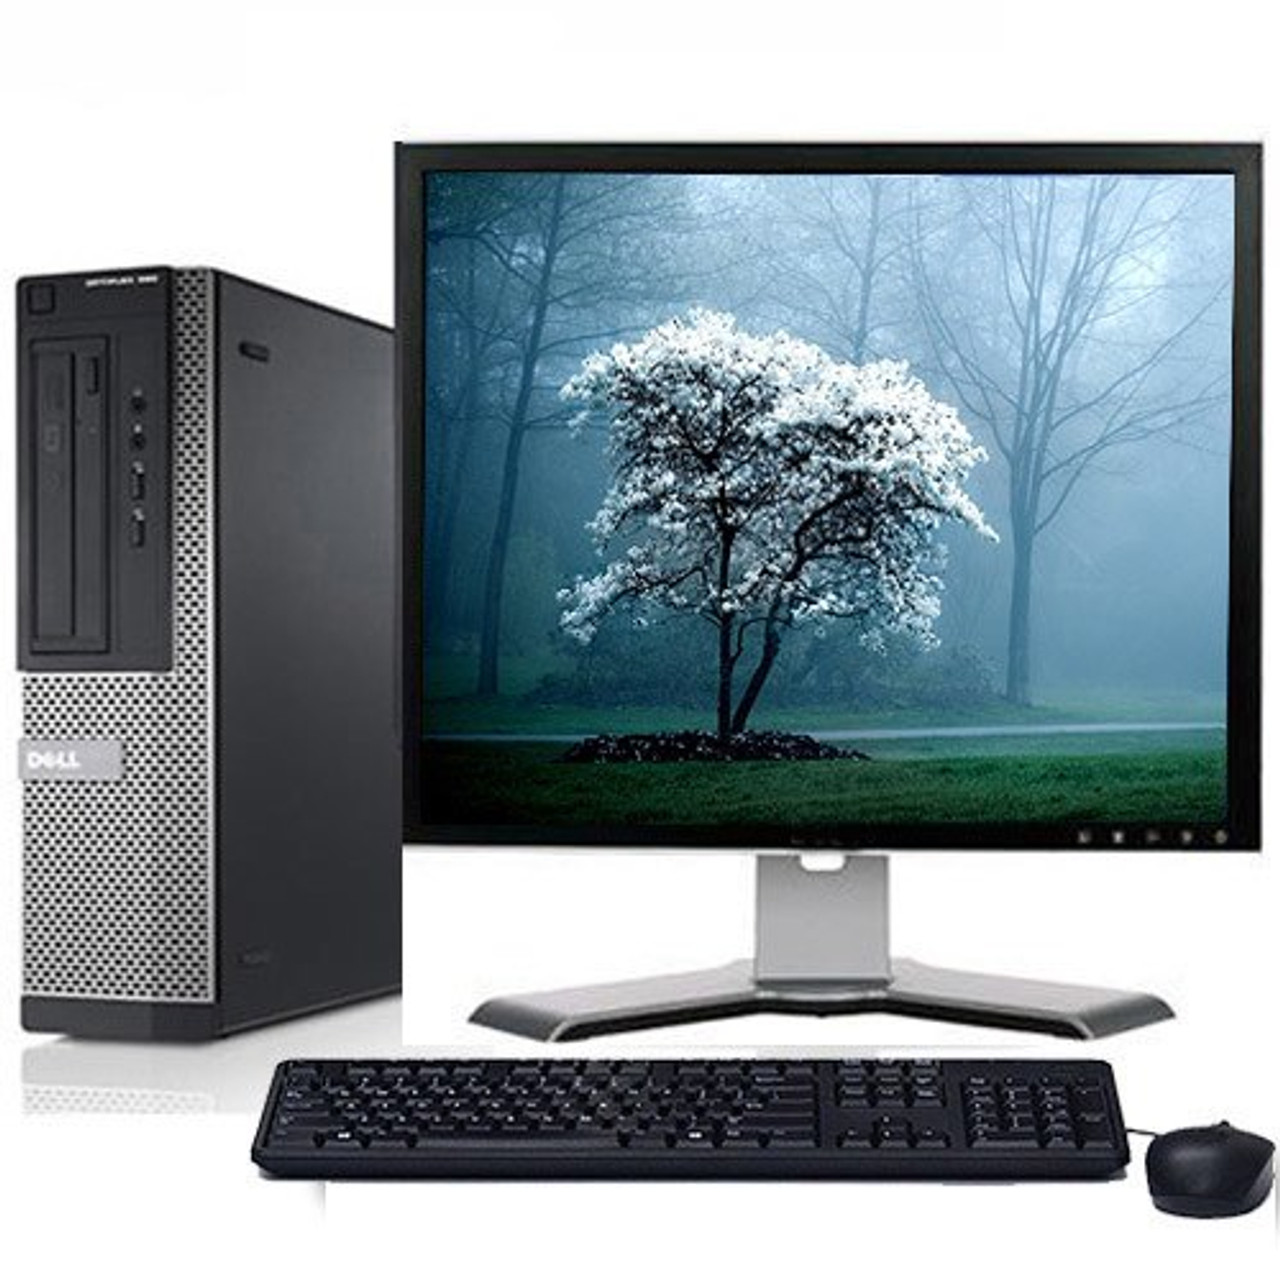 fast dell optiplex desktop computer pc core i3 3 1ghz dvd wifi 17 rh discountcomputerdepot com